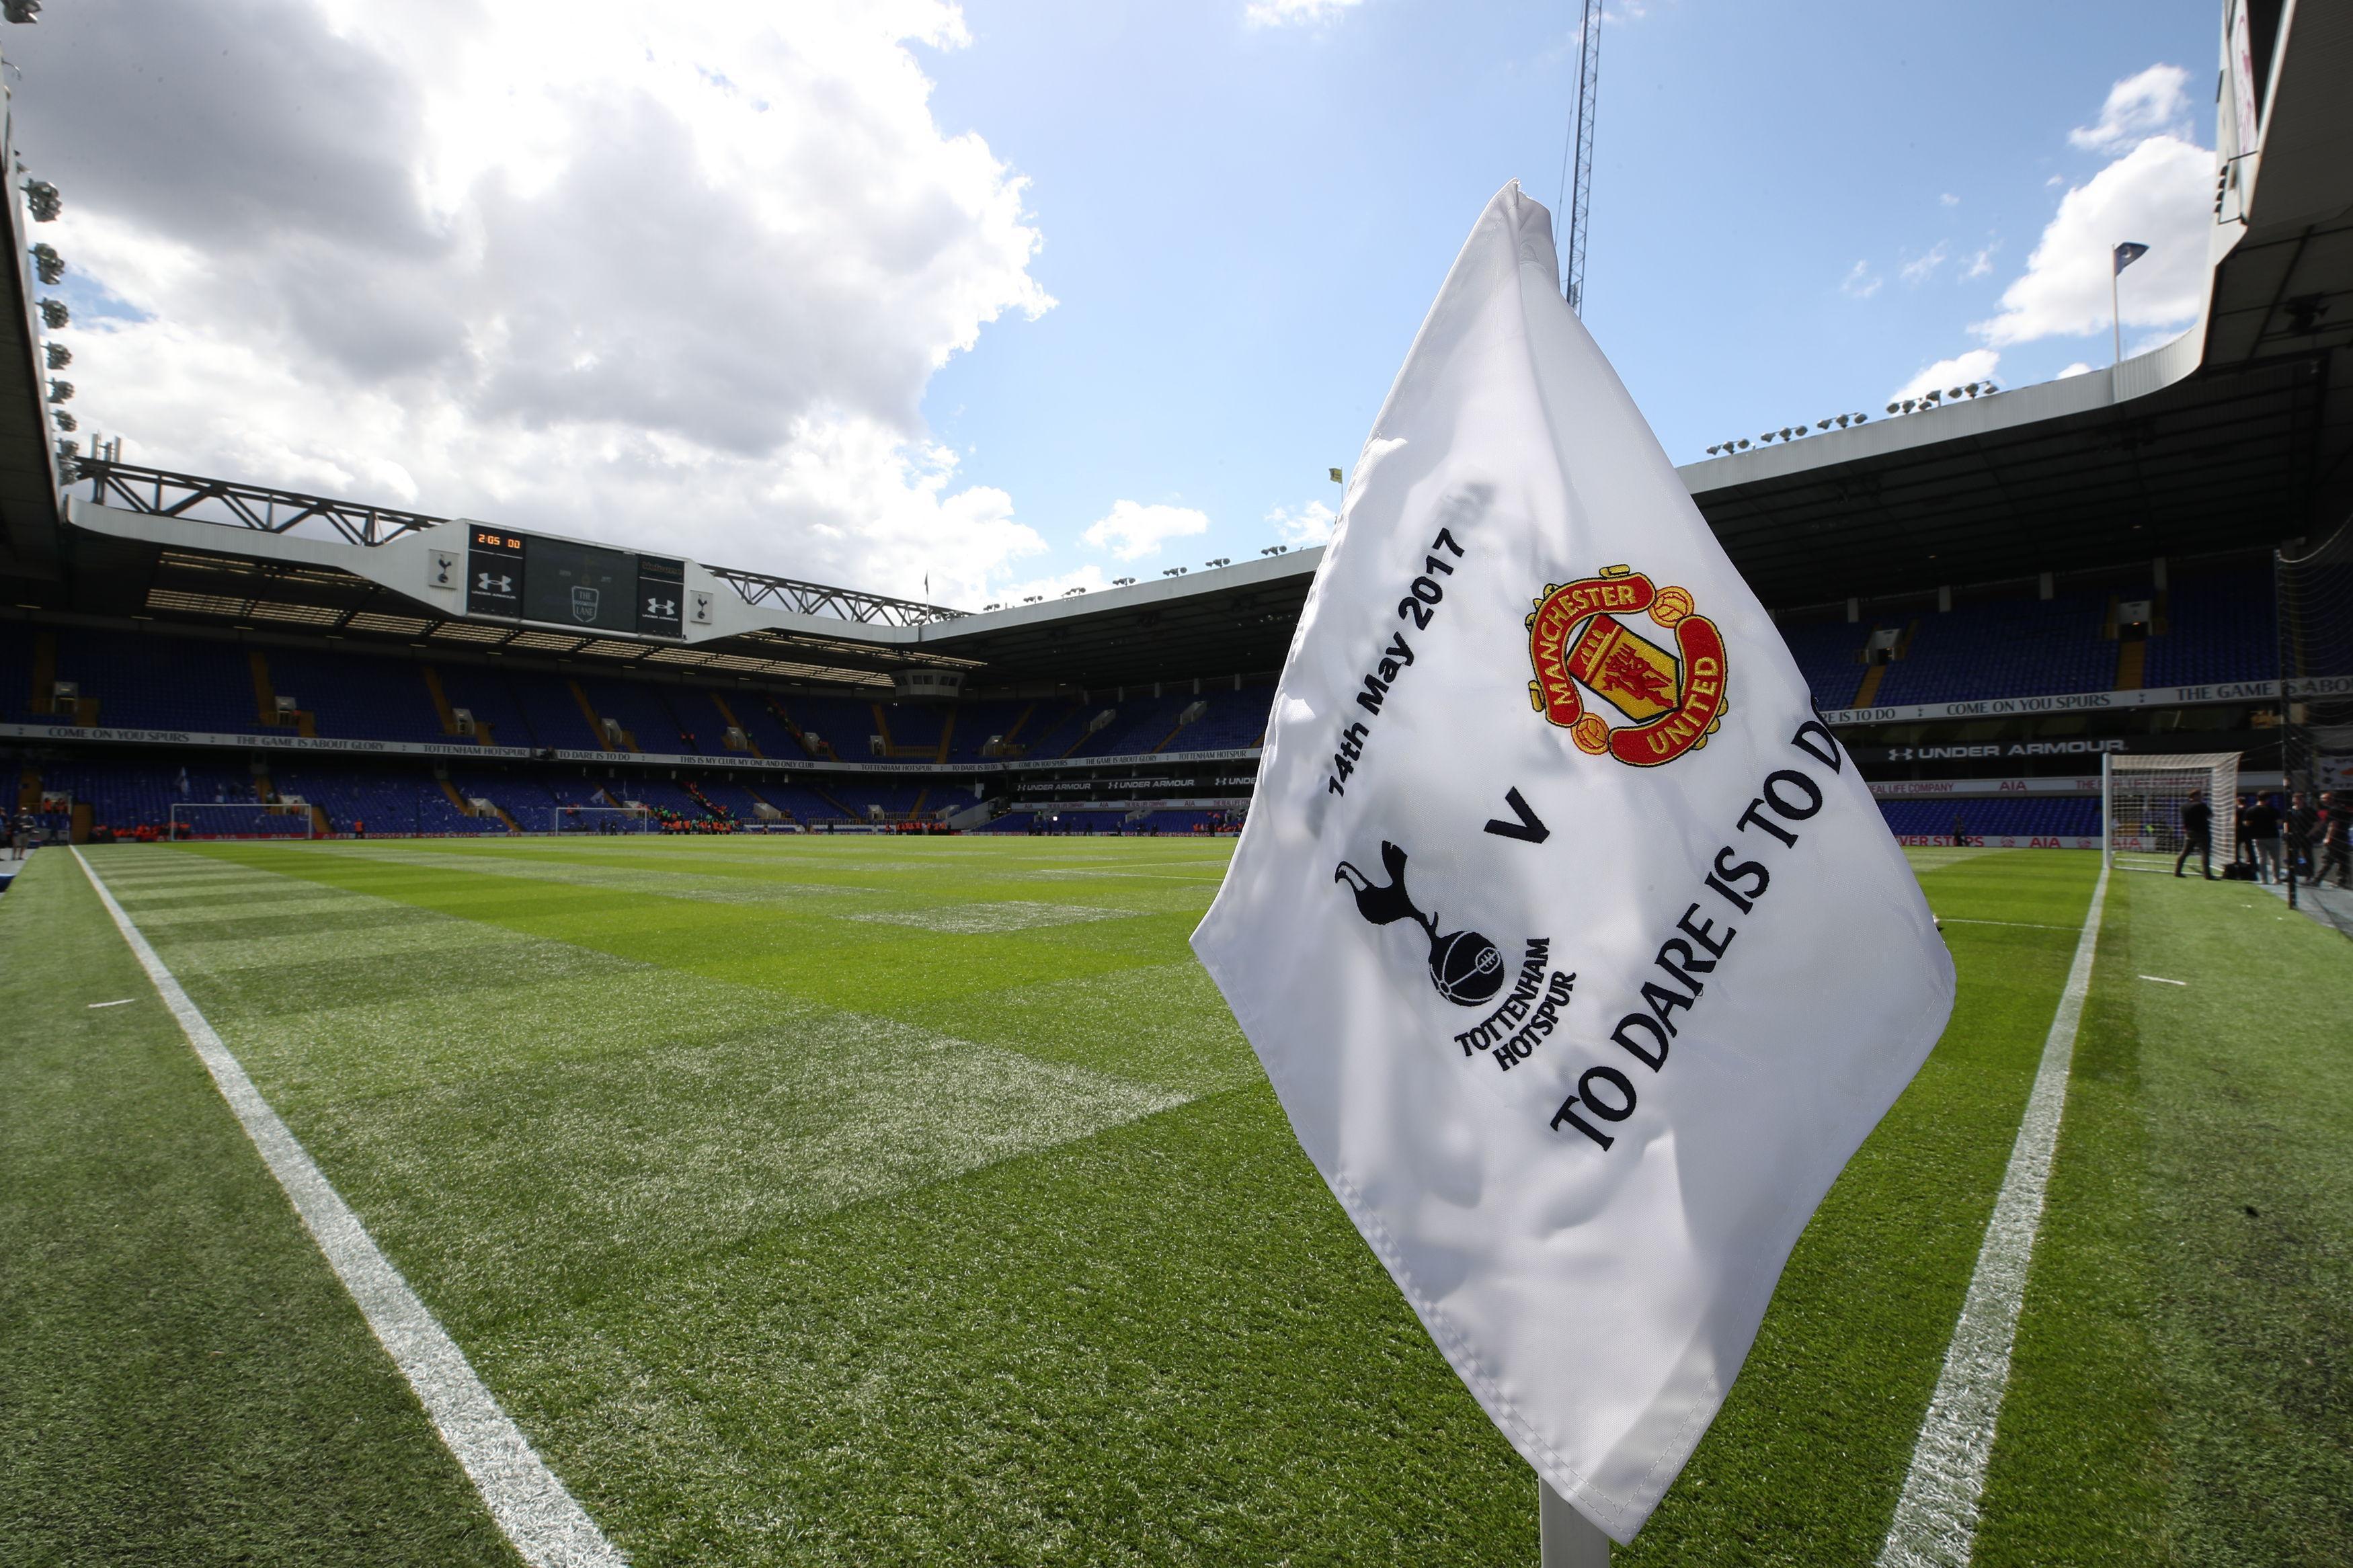 Tottenham will bid an romantic farewell to White Hart Lane against Manchester United on Sunday